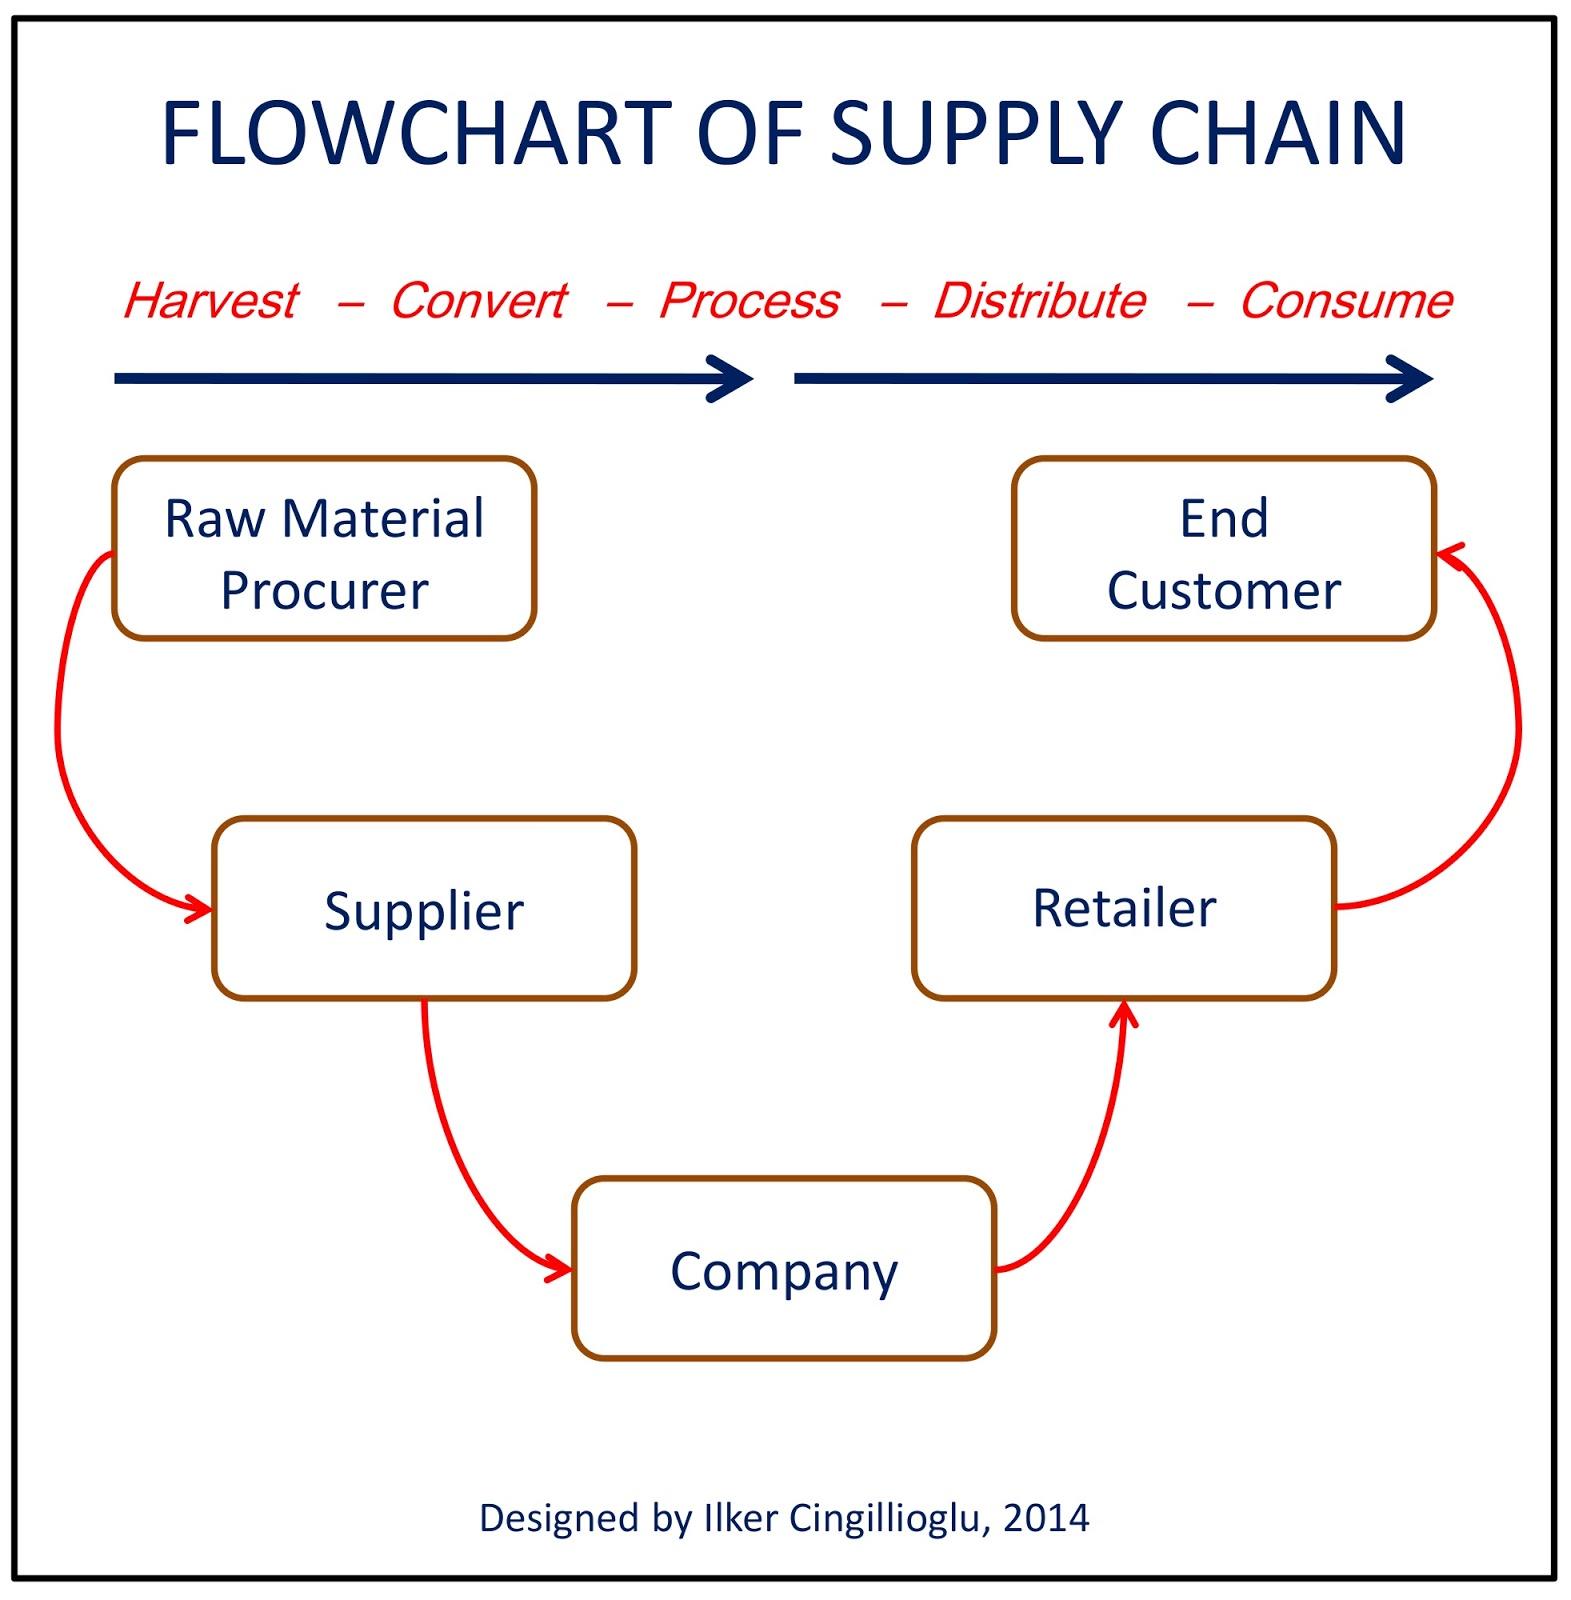 Logistics Management, Milk Run Logistics, Milk Run System, Logistics Systems, Logistics Company